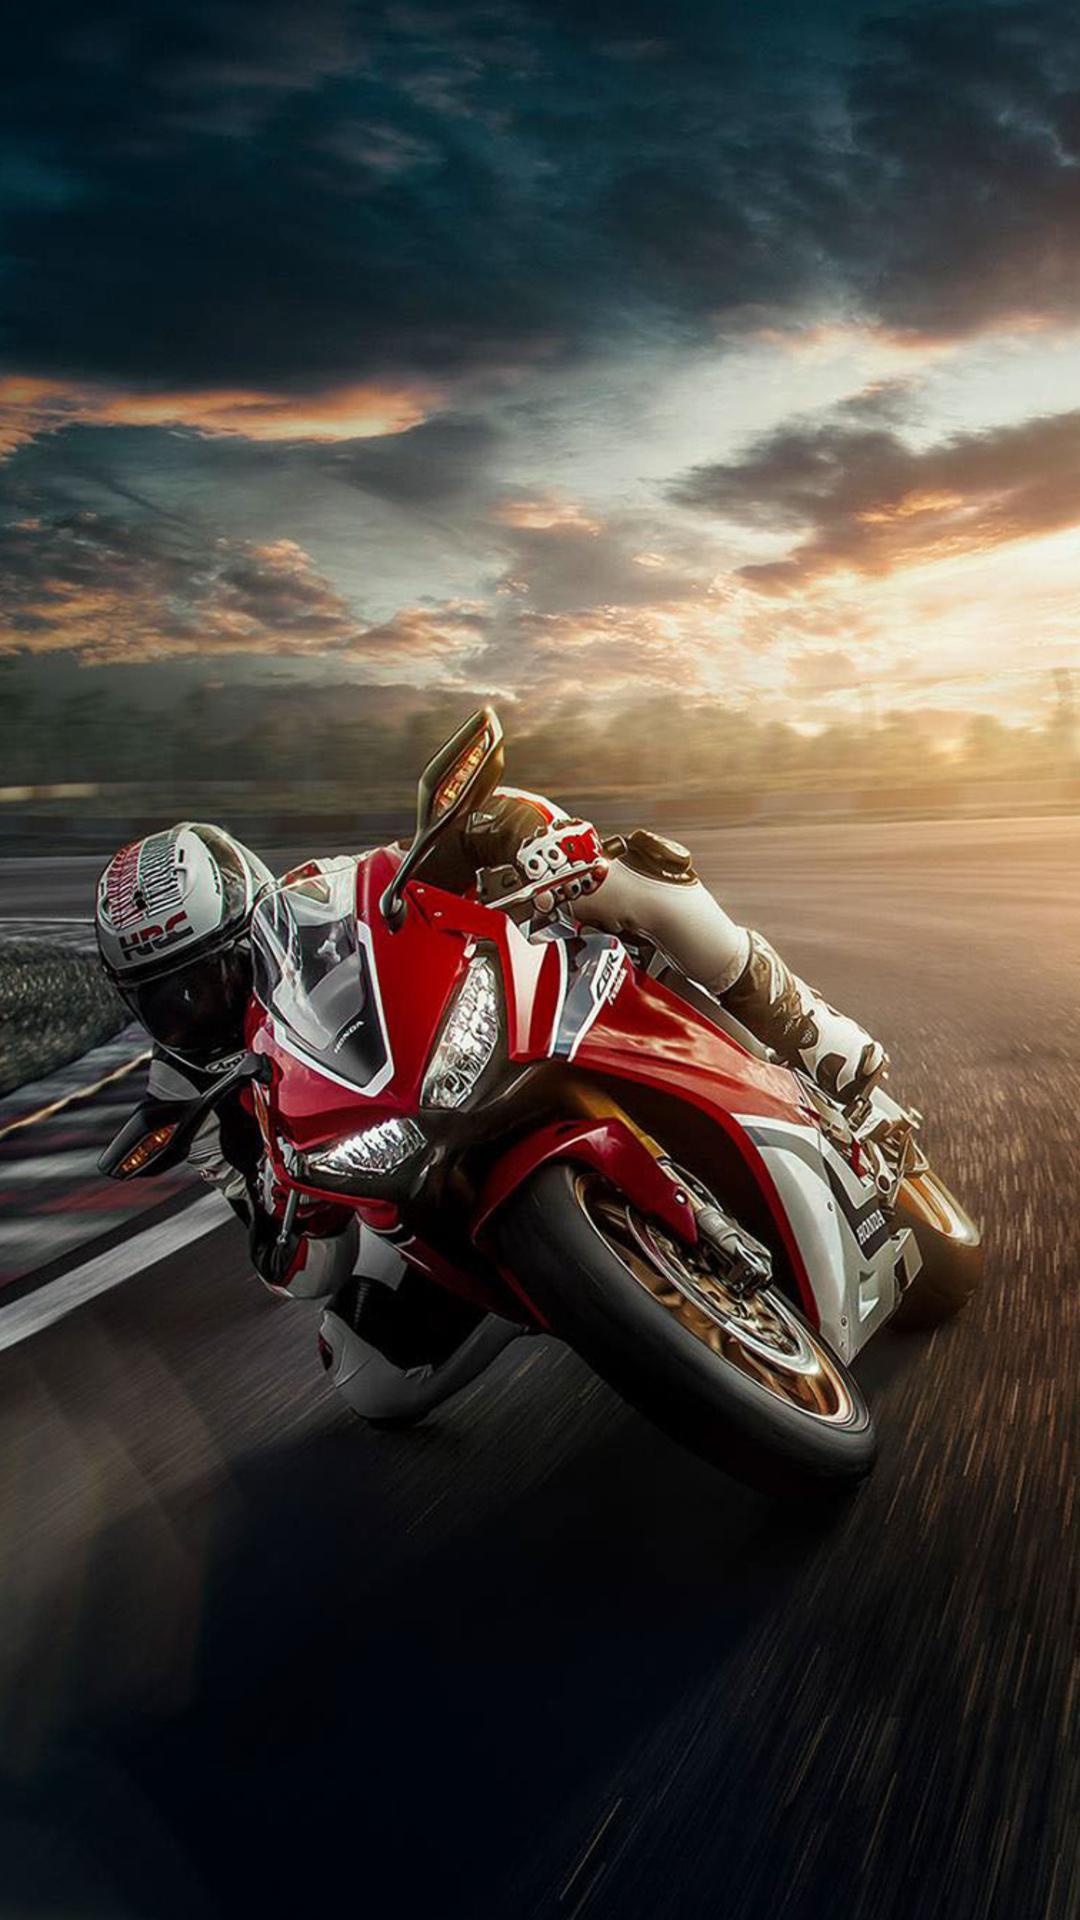 honda-motorcycle-track-bike-qj.jpg